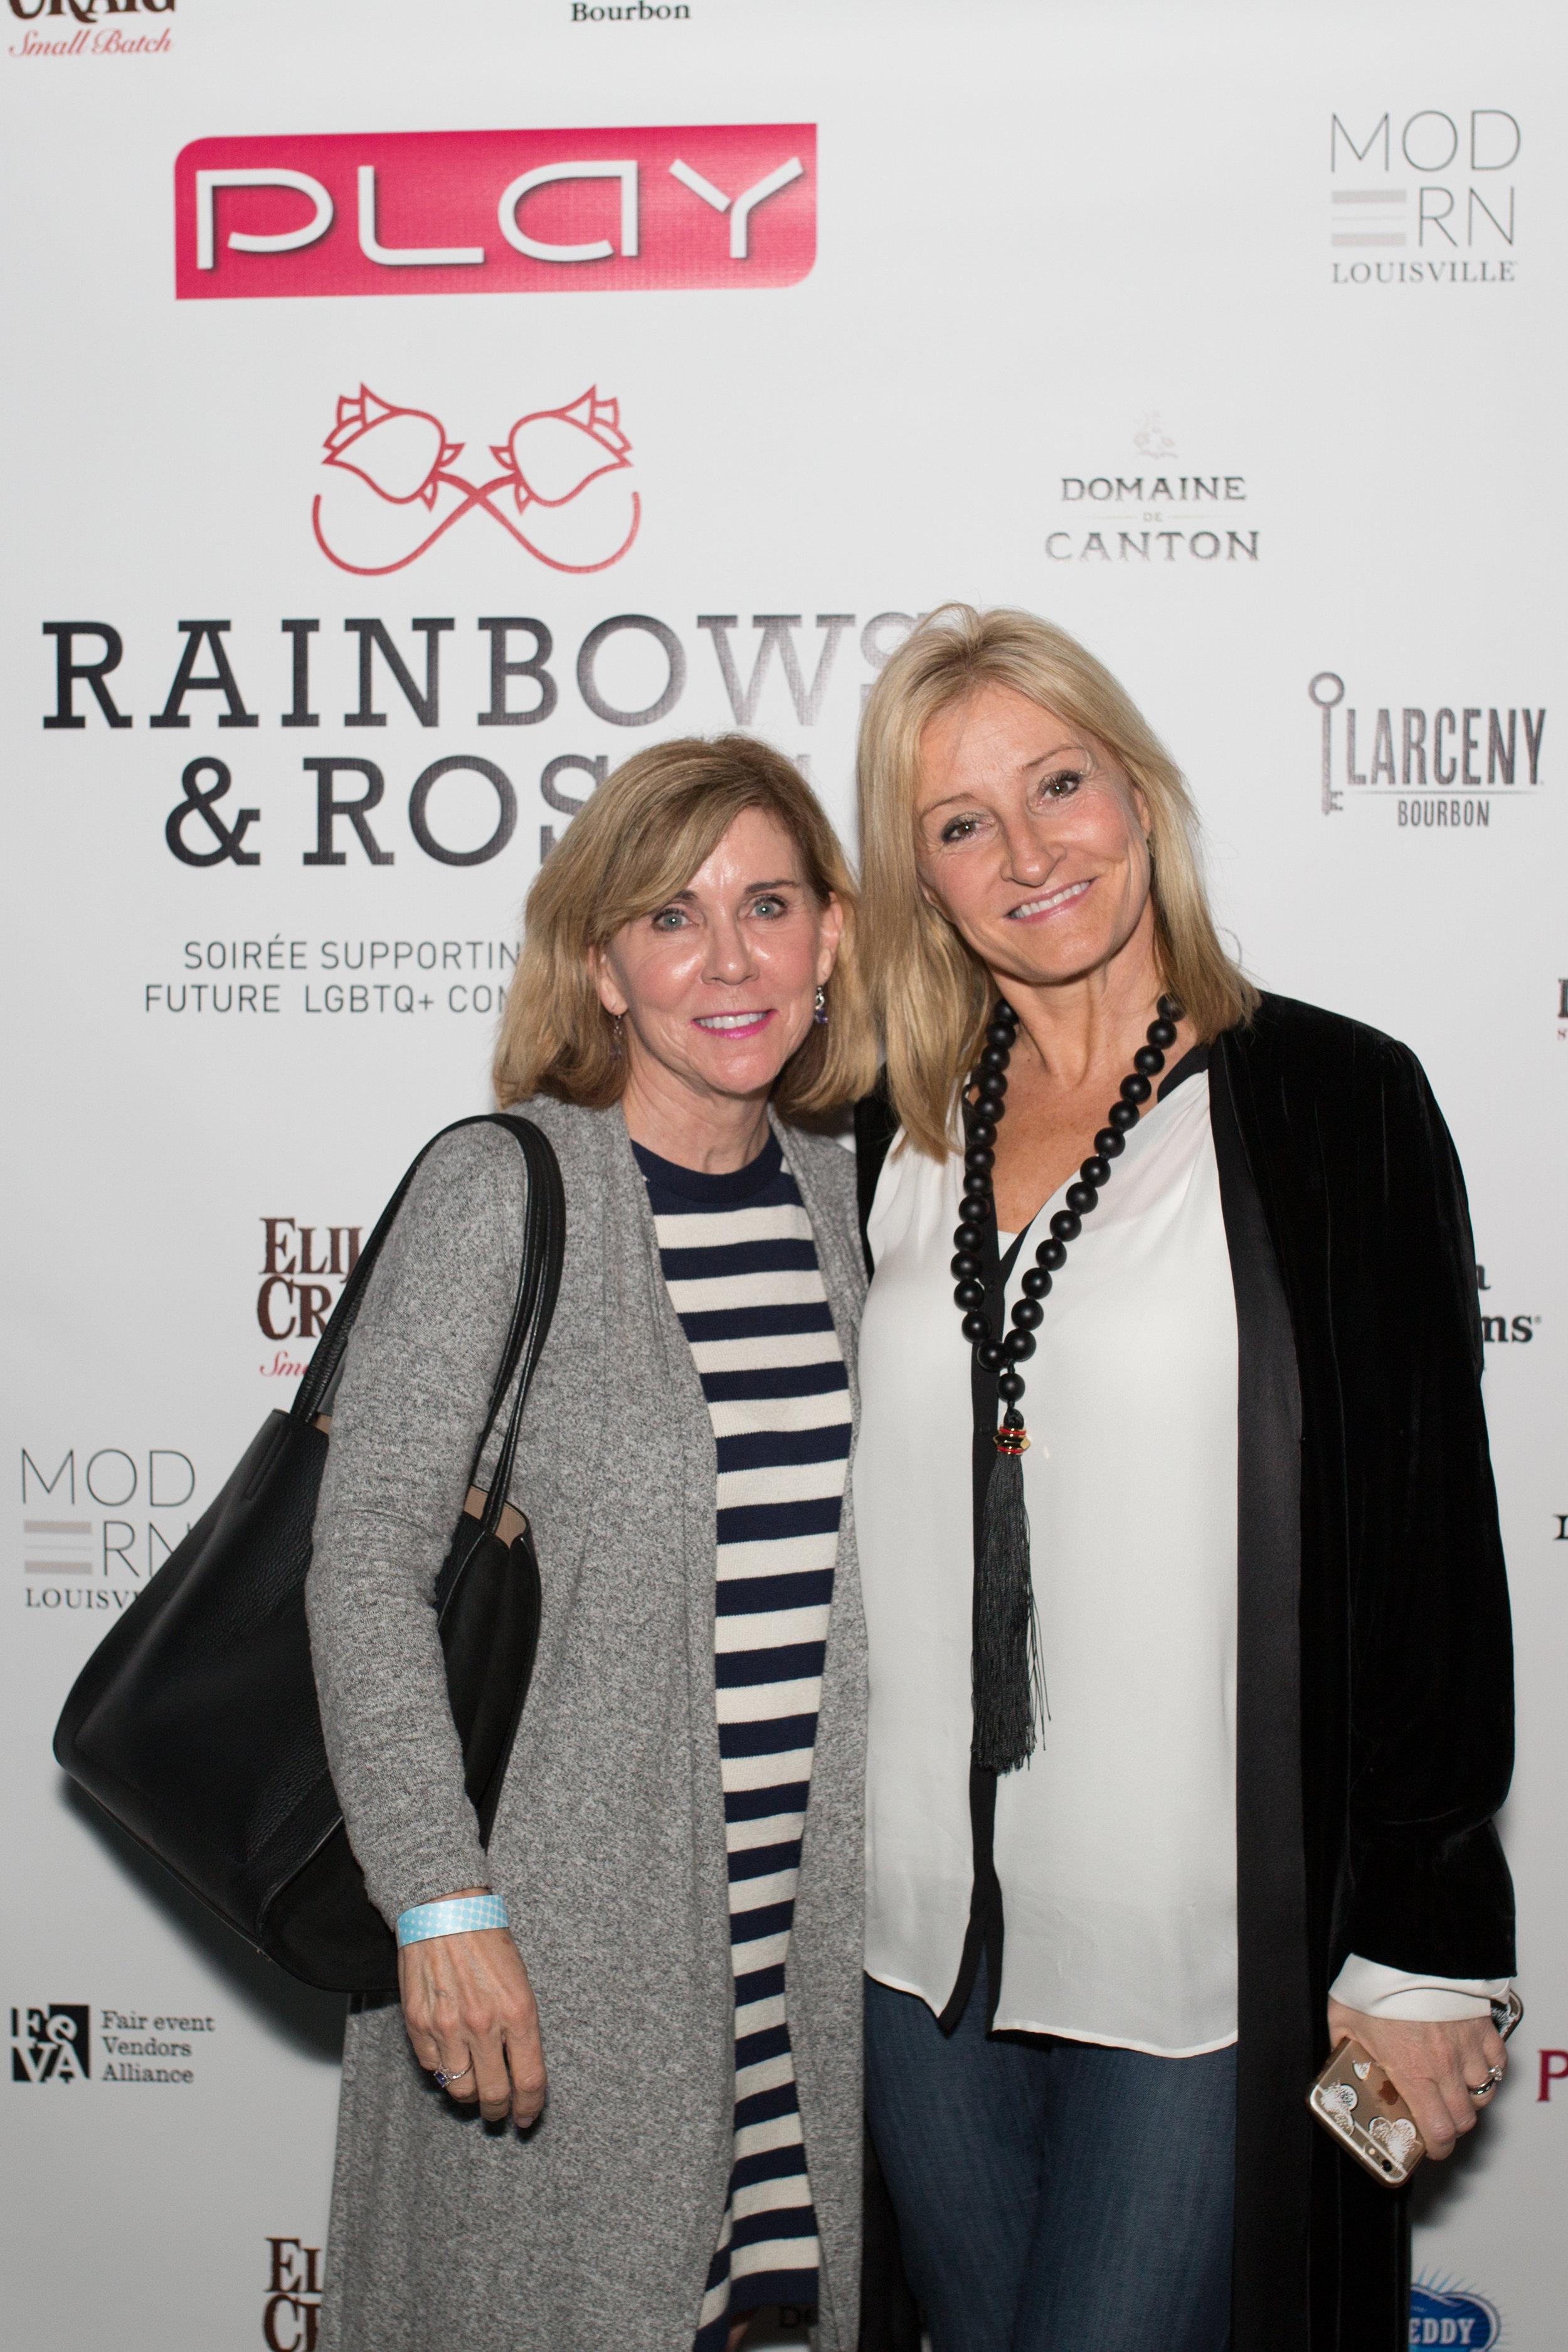 Rainbows & Roses Thurby 2017 WEBSITE FEVA PLAY Crystal Ludwick Photo 34.jpg